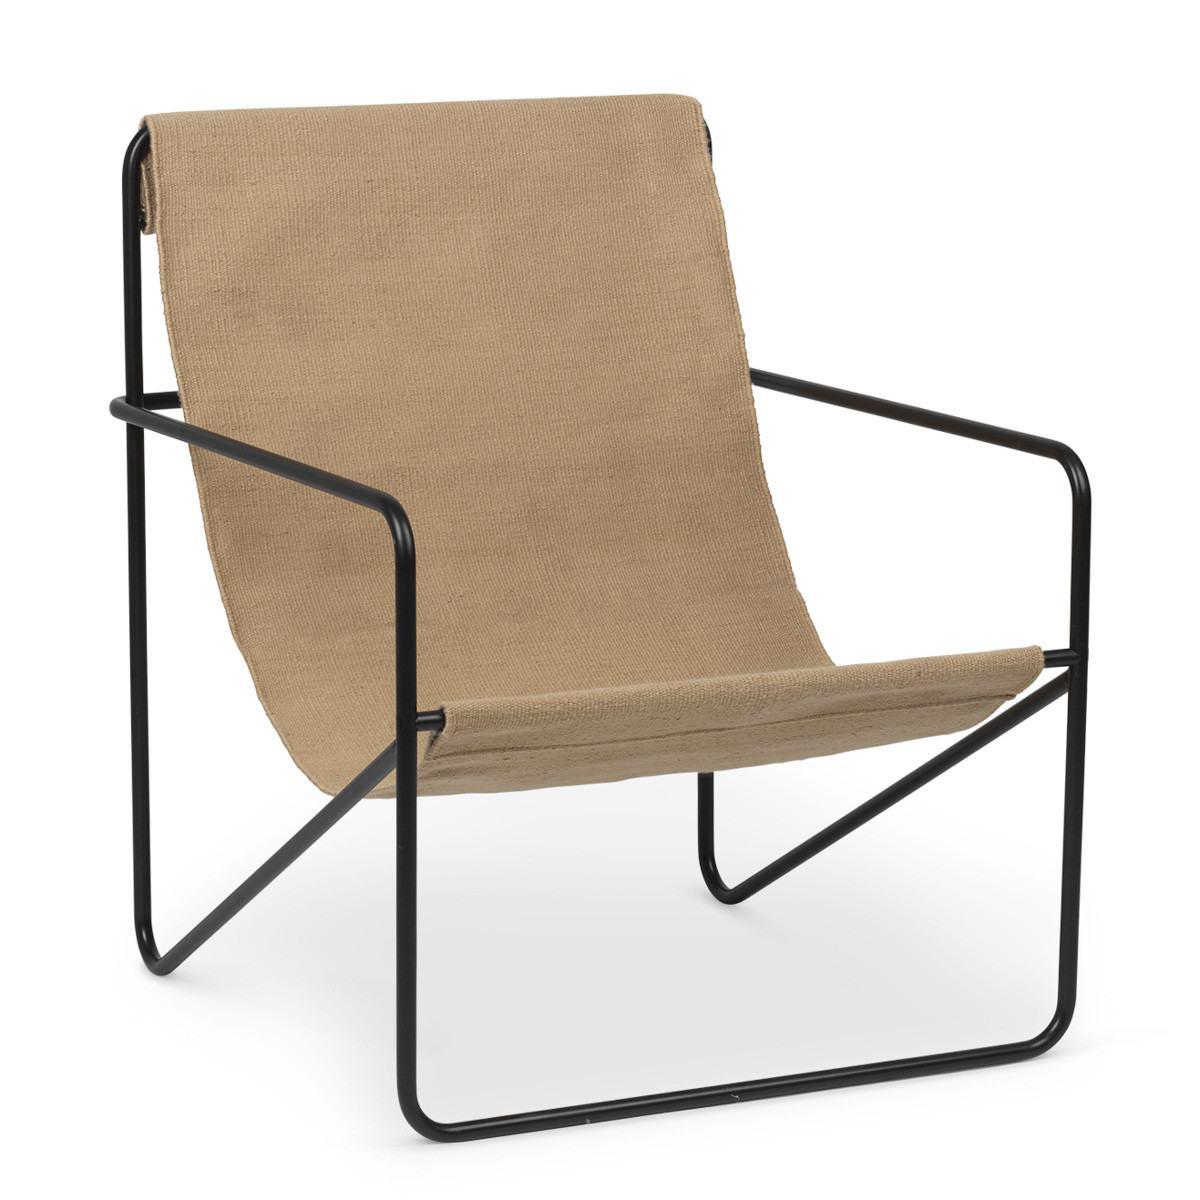 Ferm Living Desert Lounge Chair - Solid-Black